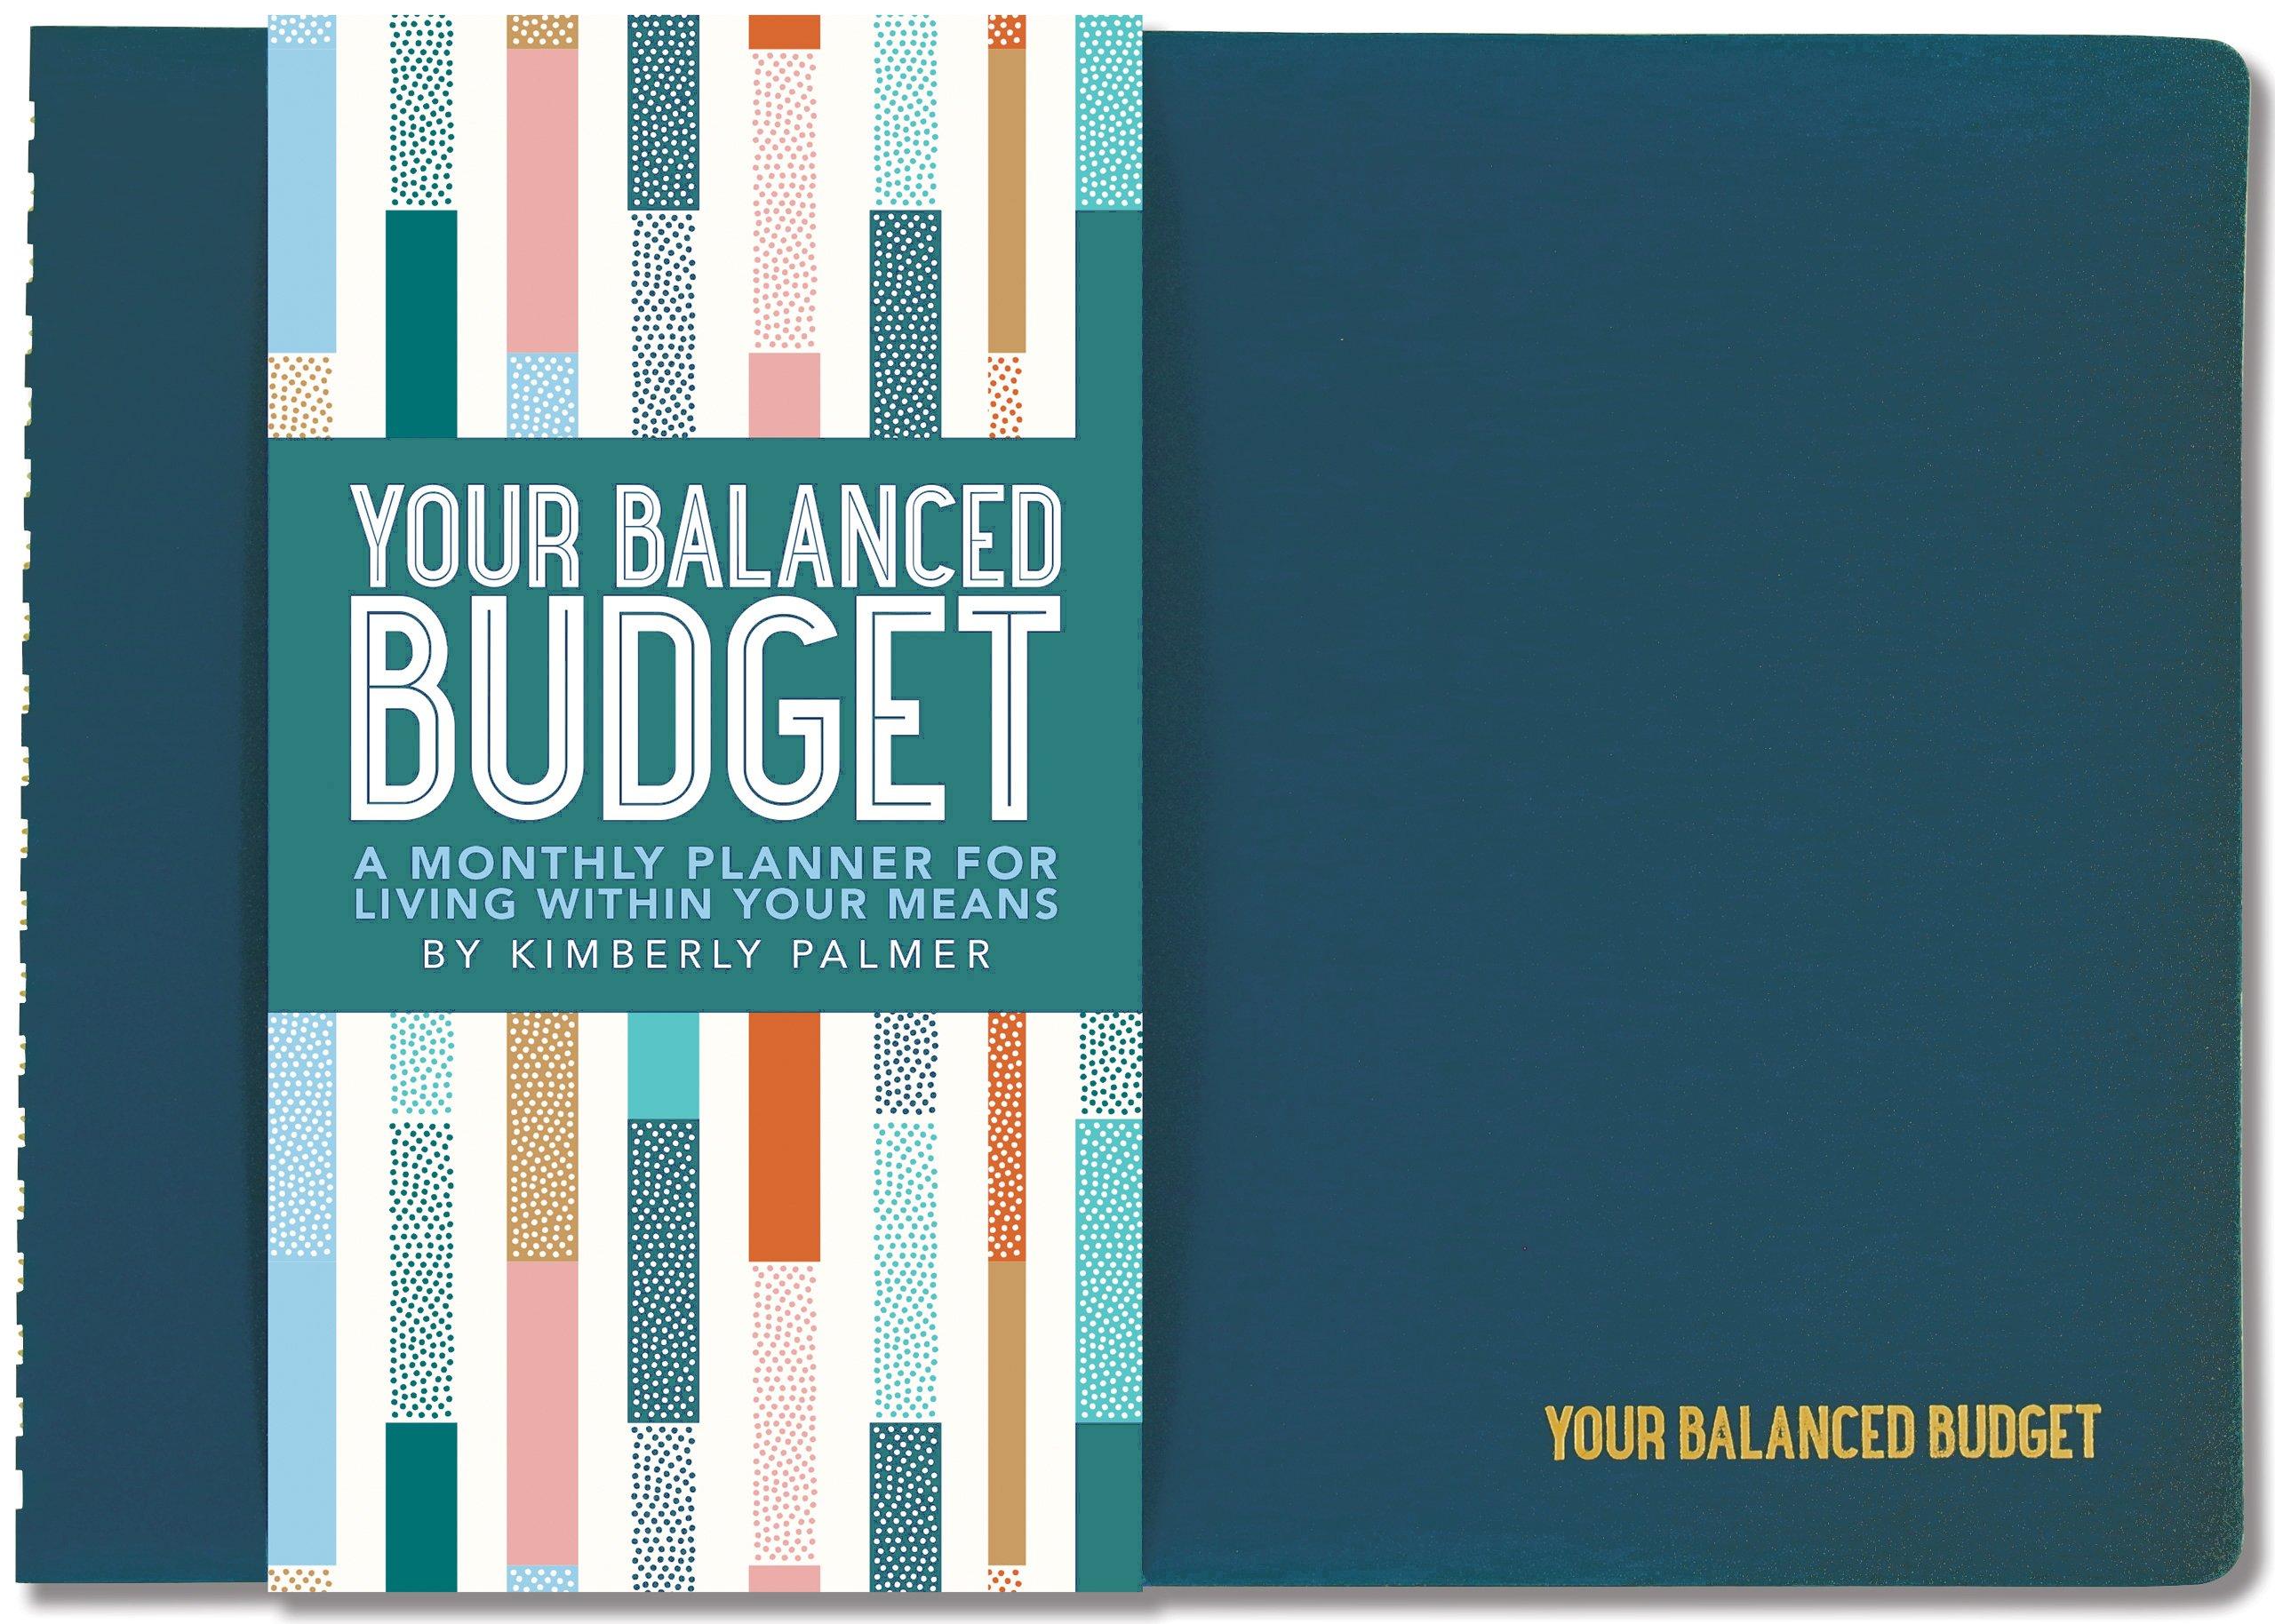 how to budget save money tips tricks balanced planner spiral bound